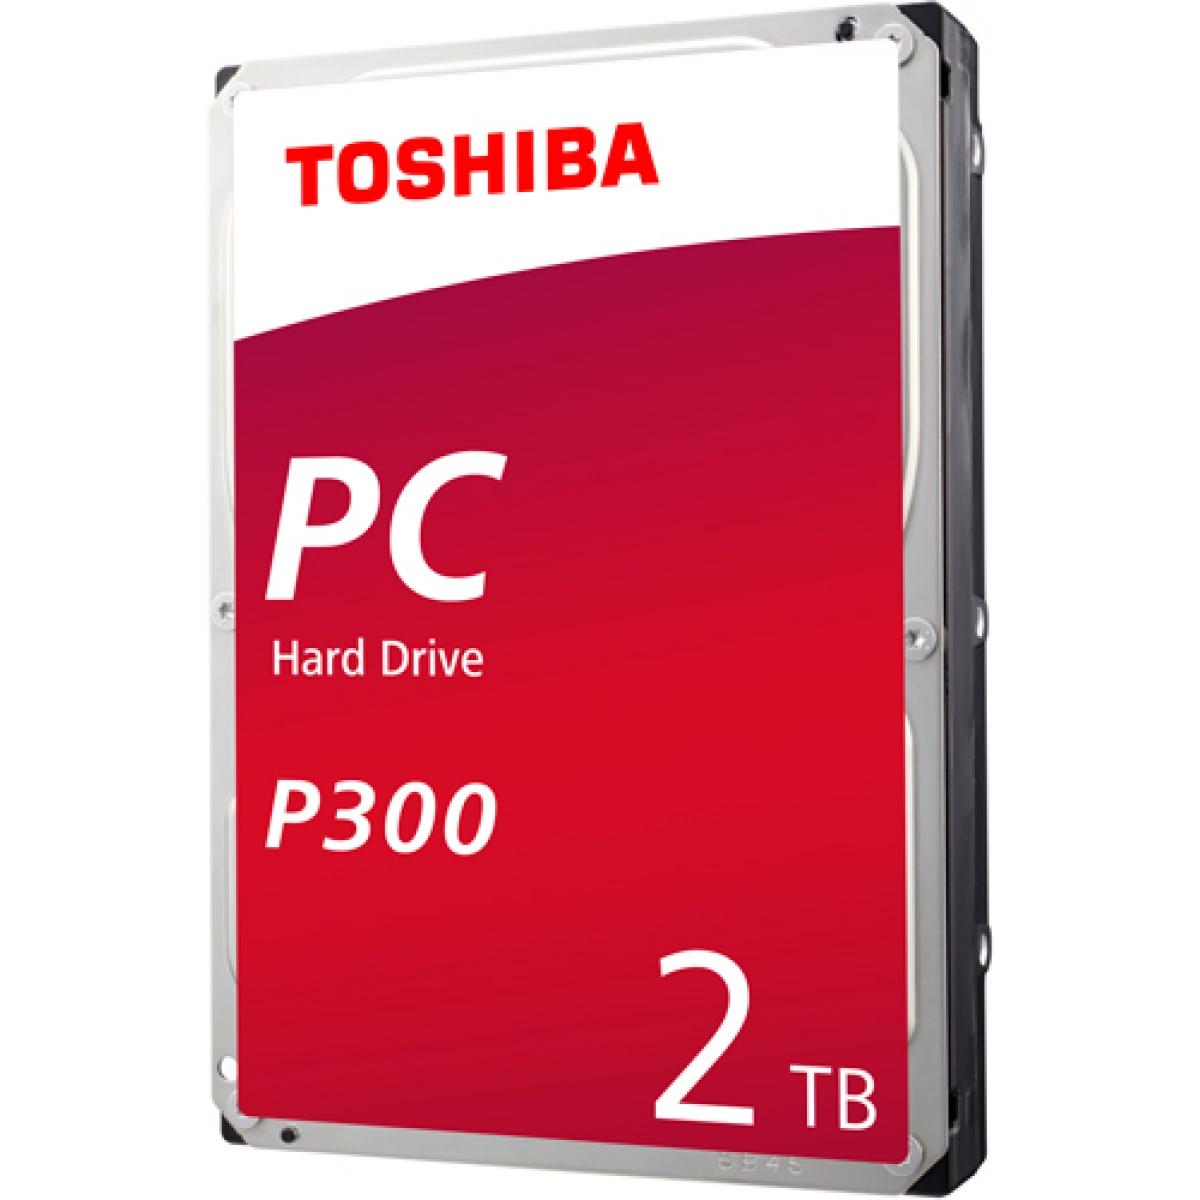 HD Toshiba P300 2TB, Sata III, 7200RPM, 64MB, HDWD120XZSTA - Open Box